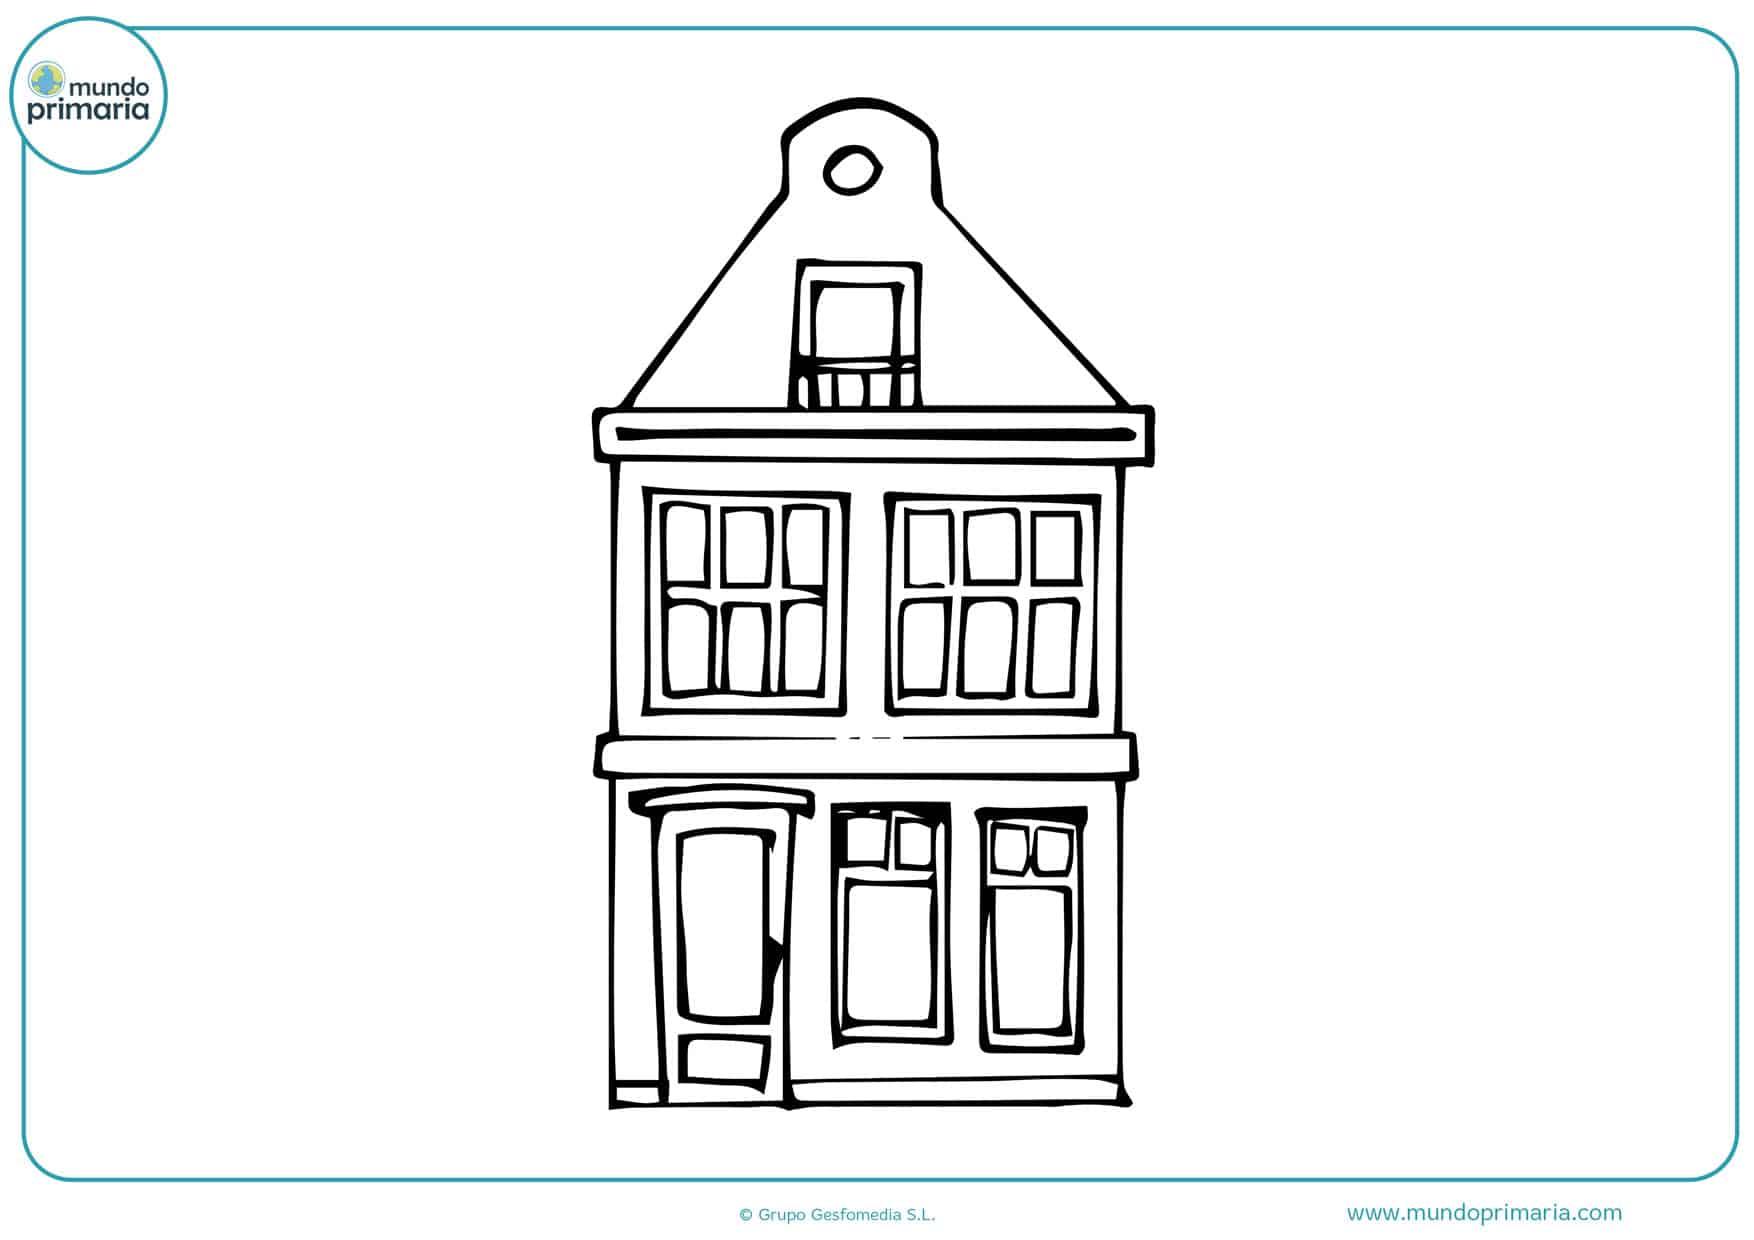 dibujos de casas de muñecas para colorear